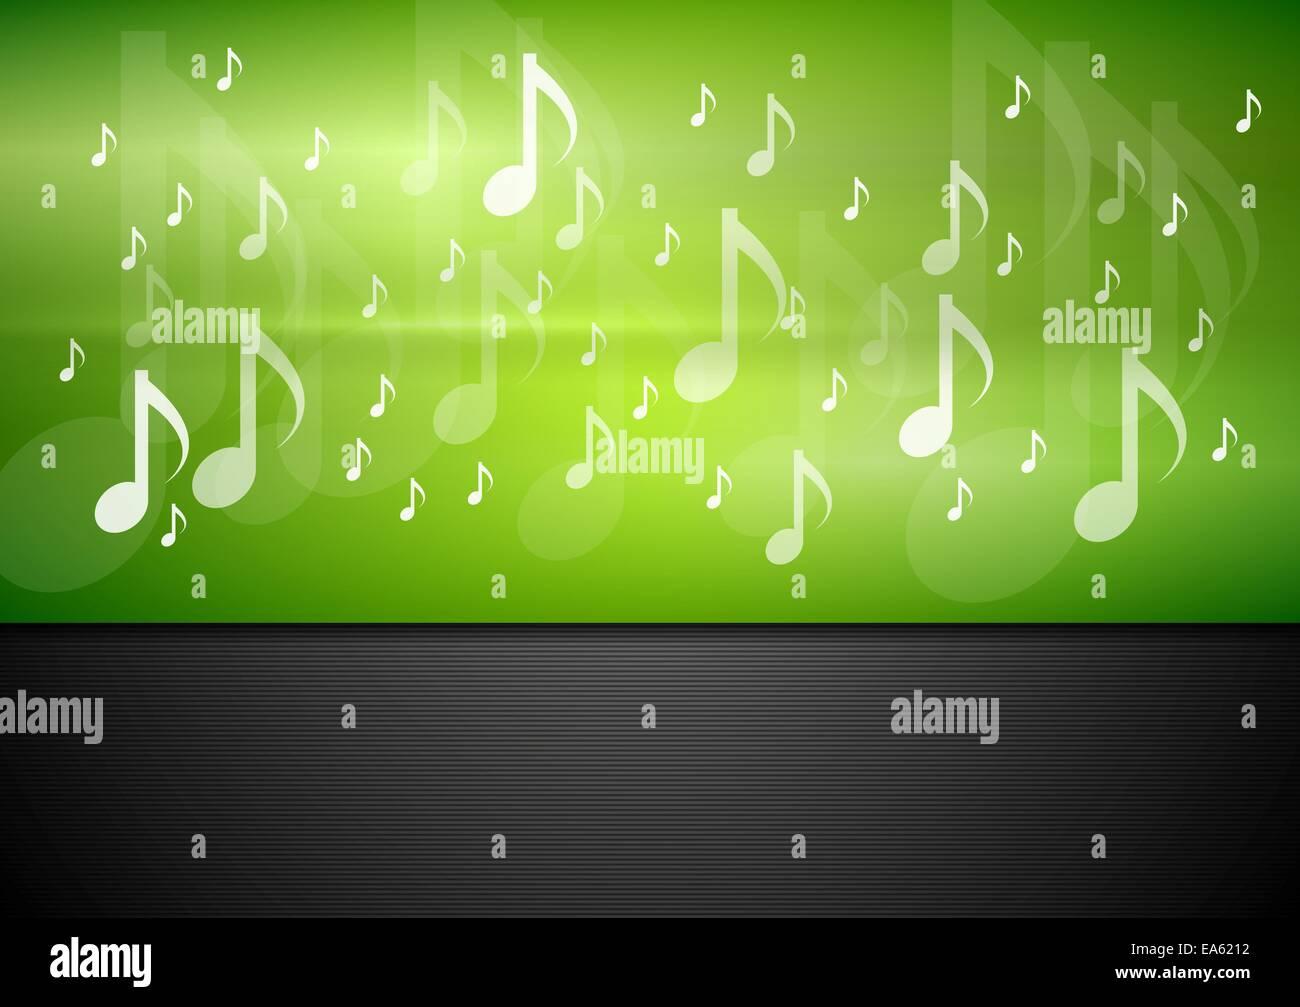 Best Wallpaper Music Bright - bright-music-background-EA6212  Image_798663.jpg